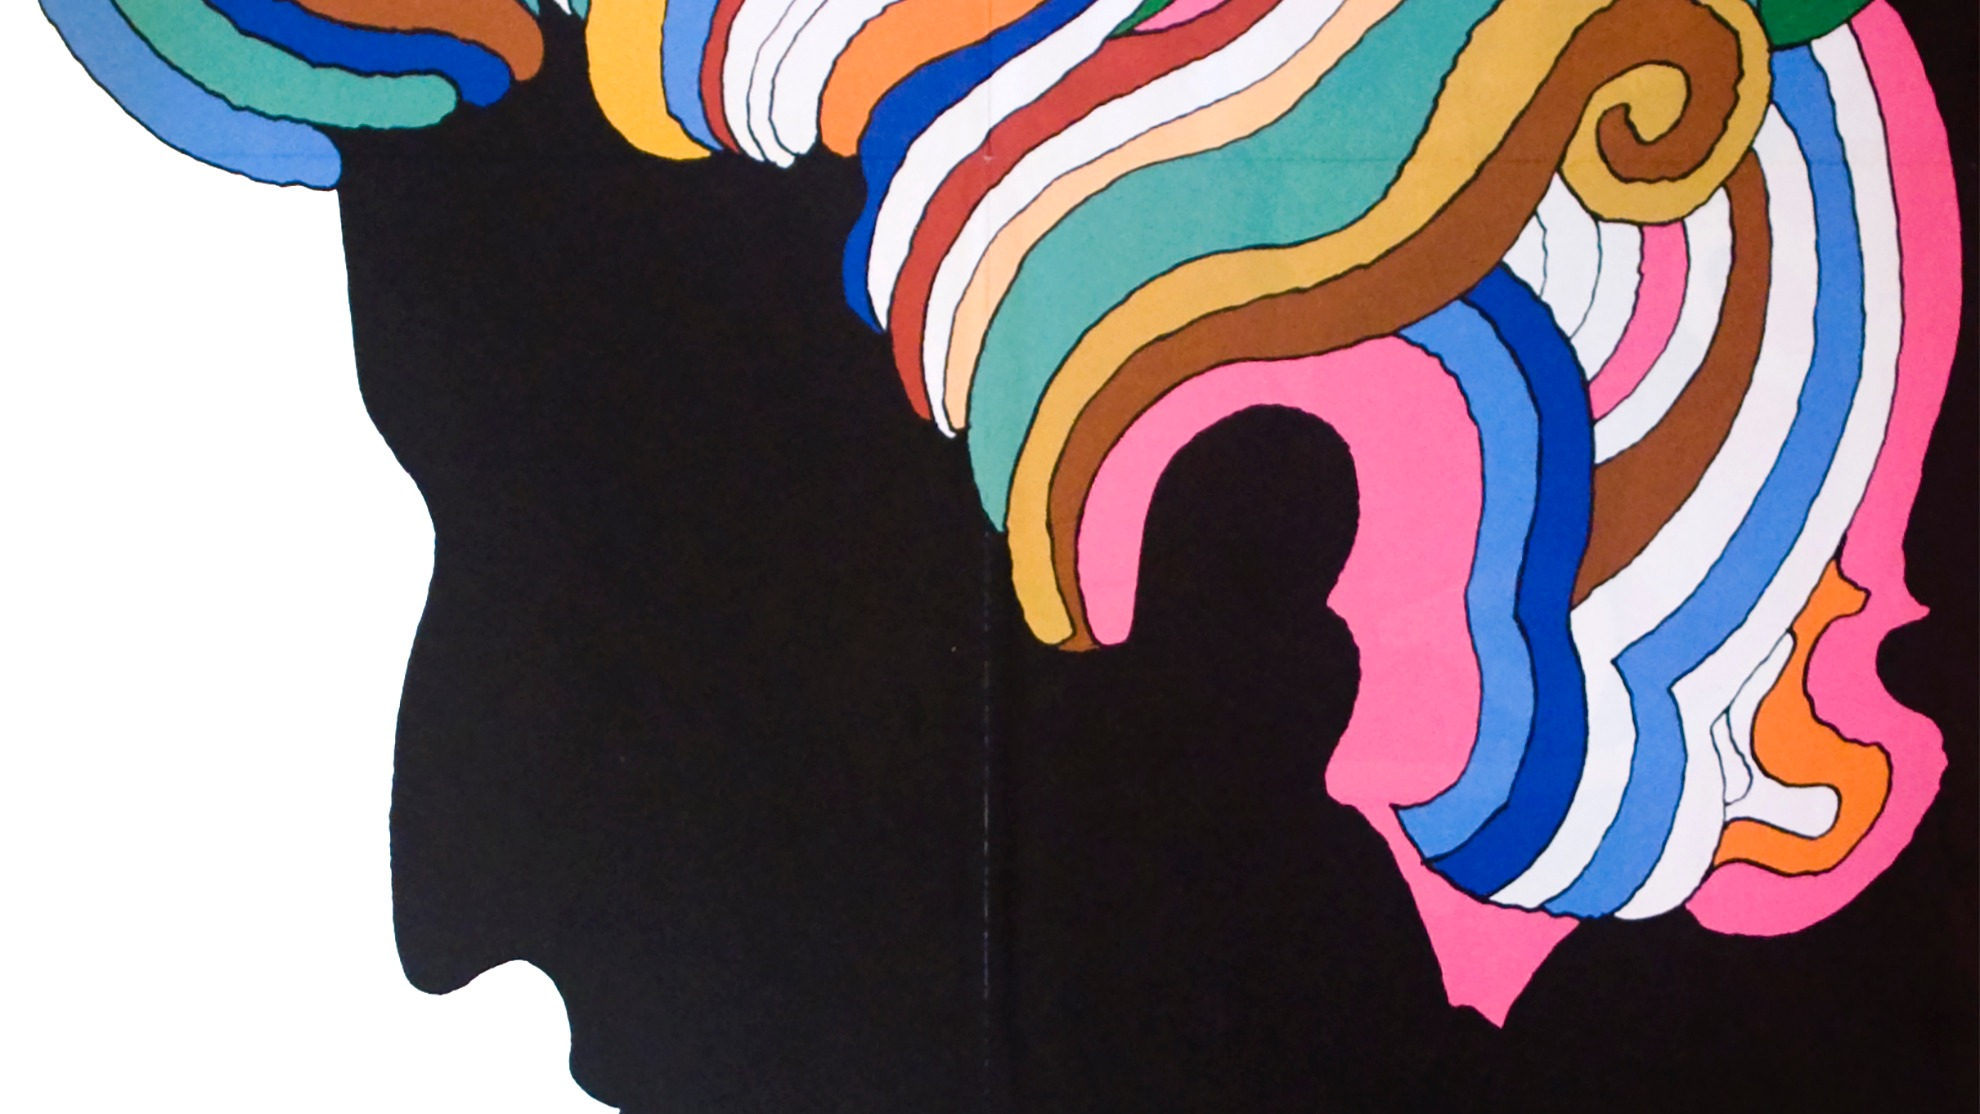 Iconic Bob Dylan poster designed by Milton Glaser.